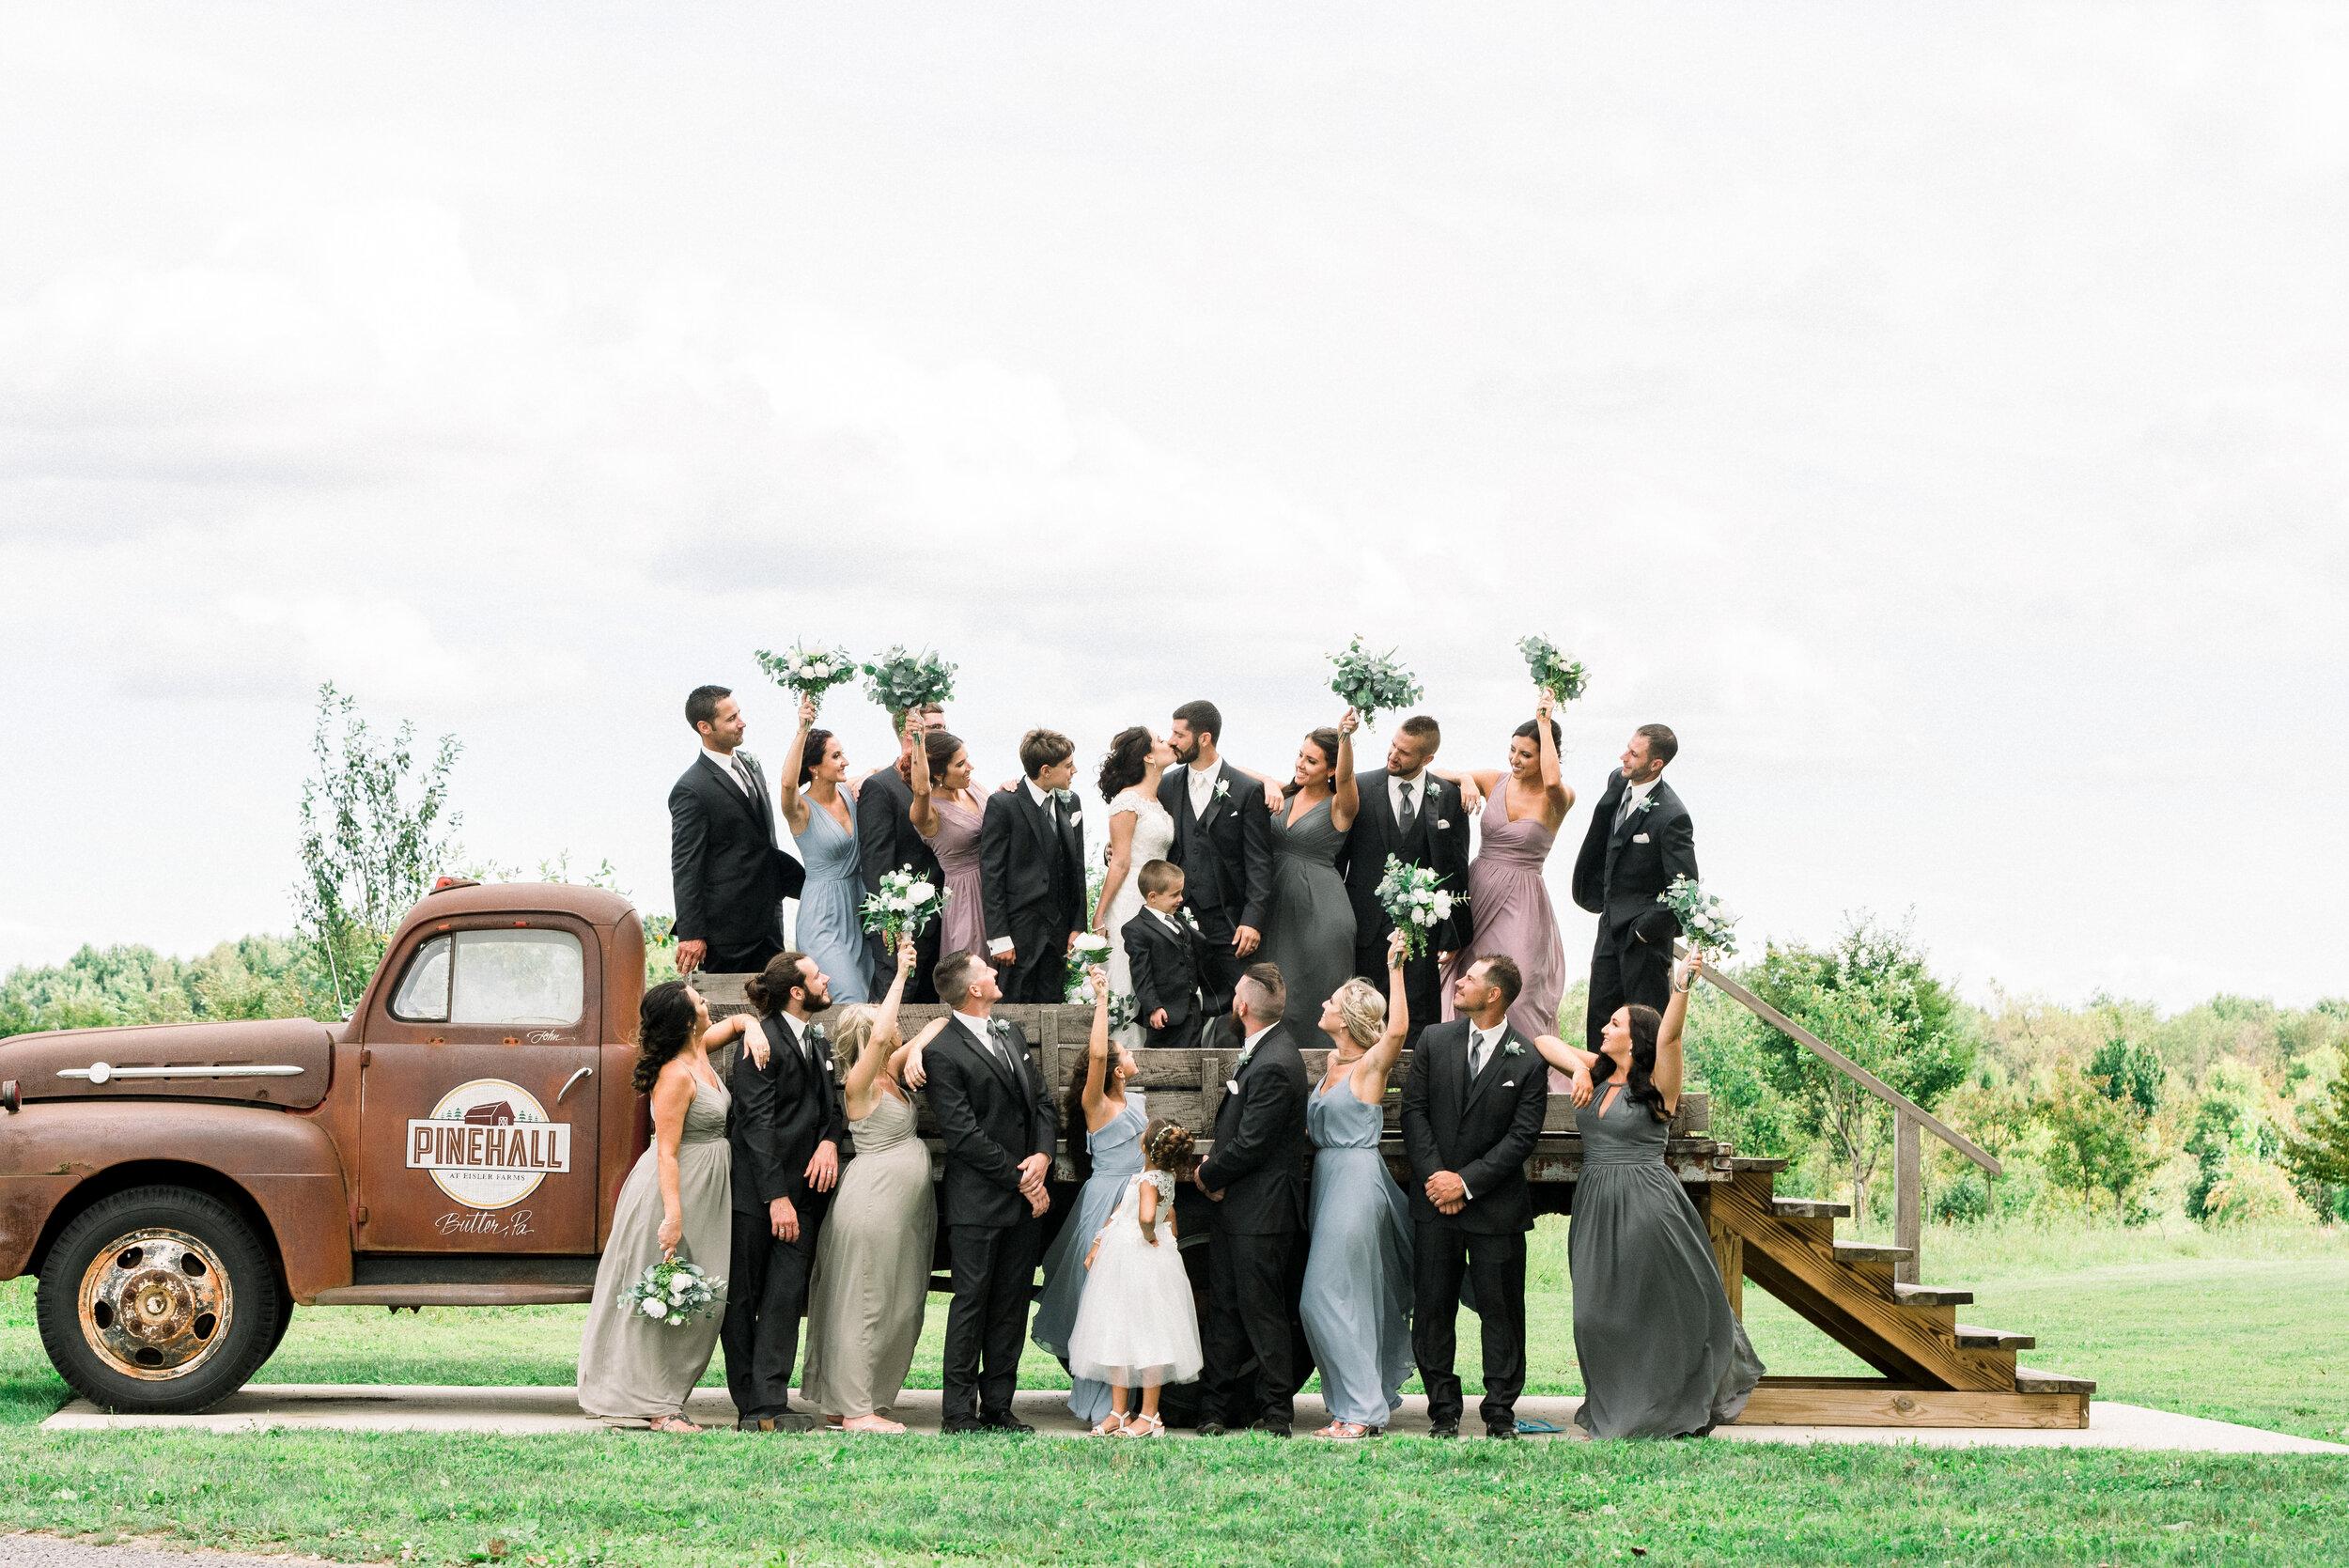 Pinehall-At-Eisler-Farms-Wedding-Ashley-Reed-Photography-27.jpg